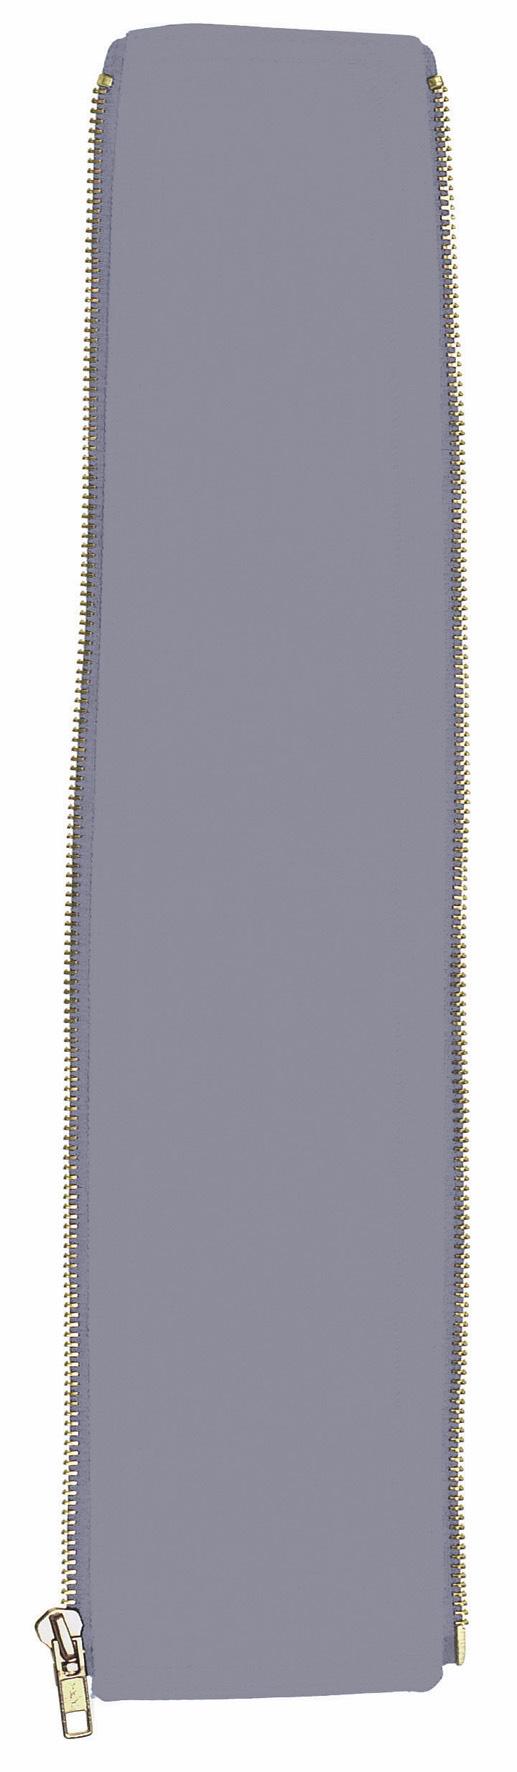 elargisseur pour gilet 3105 accessoires accessoires epi v tements et epi distriartisan. Black Bedroom Furniture Sets. Home Design Ideas